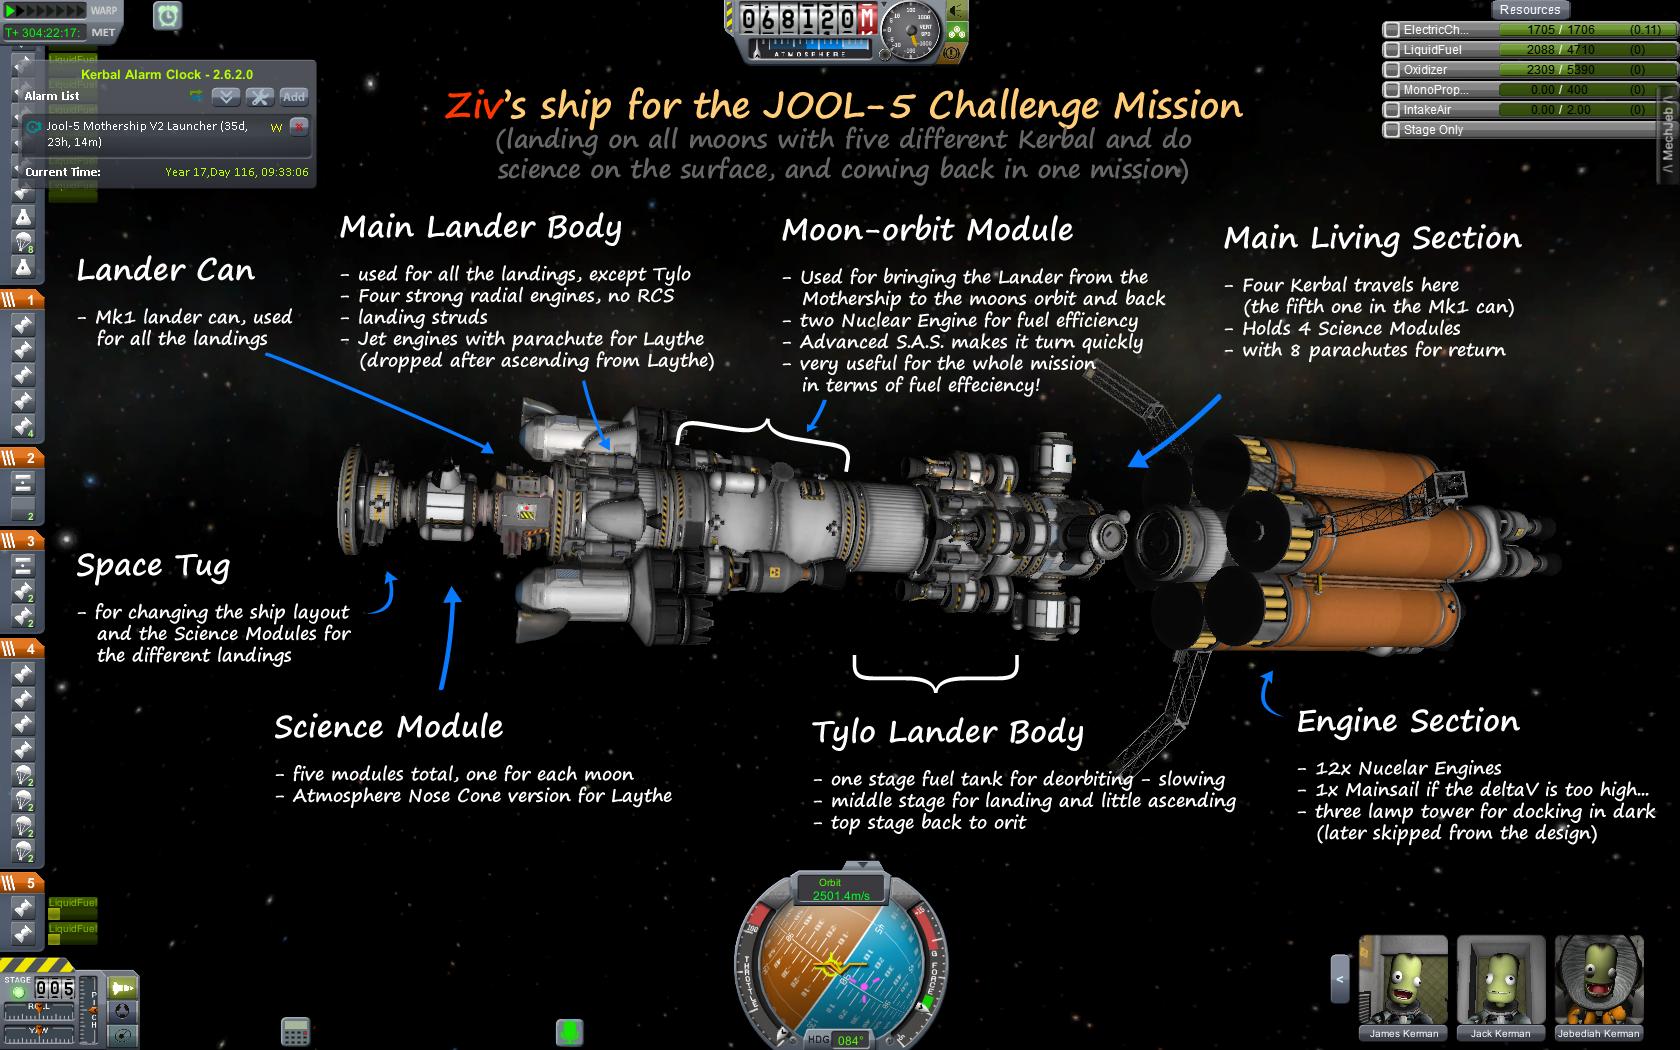 kerbal space program interplanetary ship - photo #6